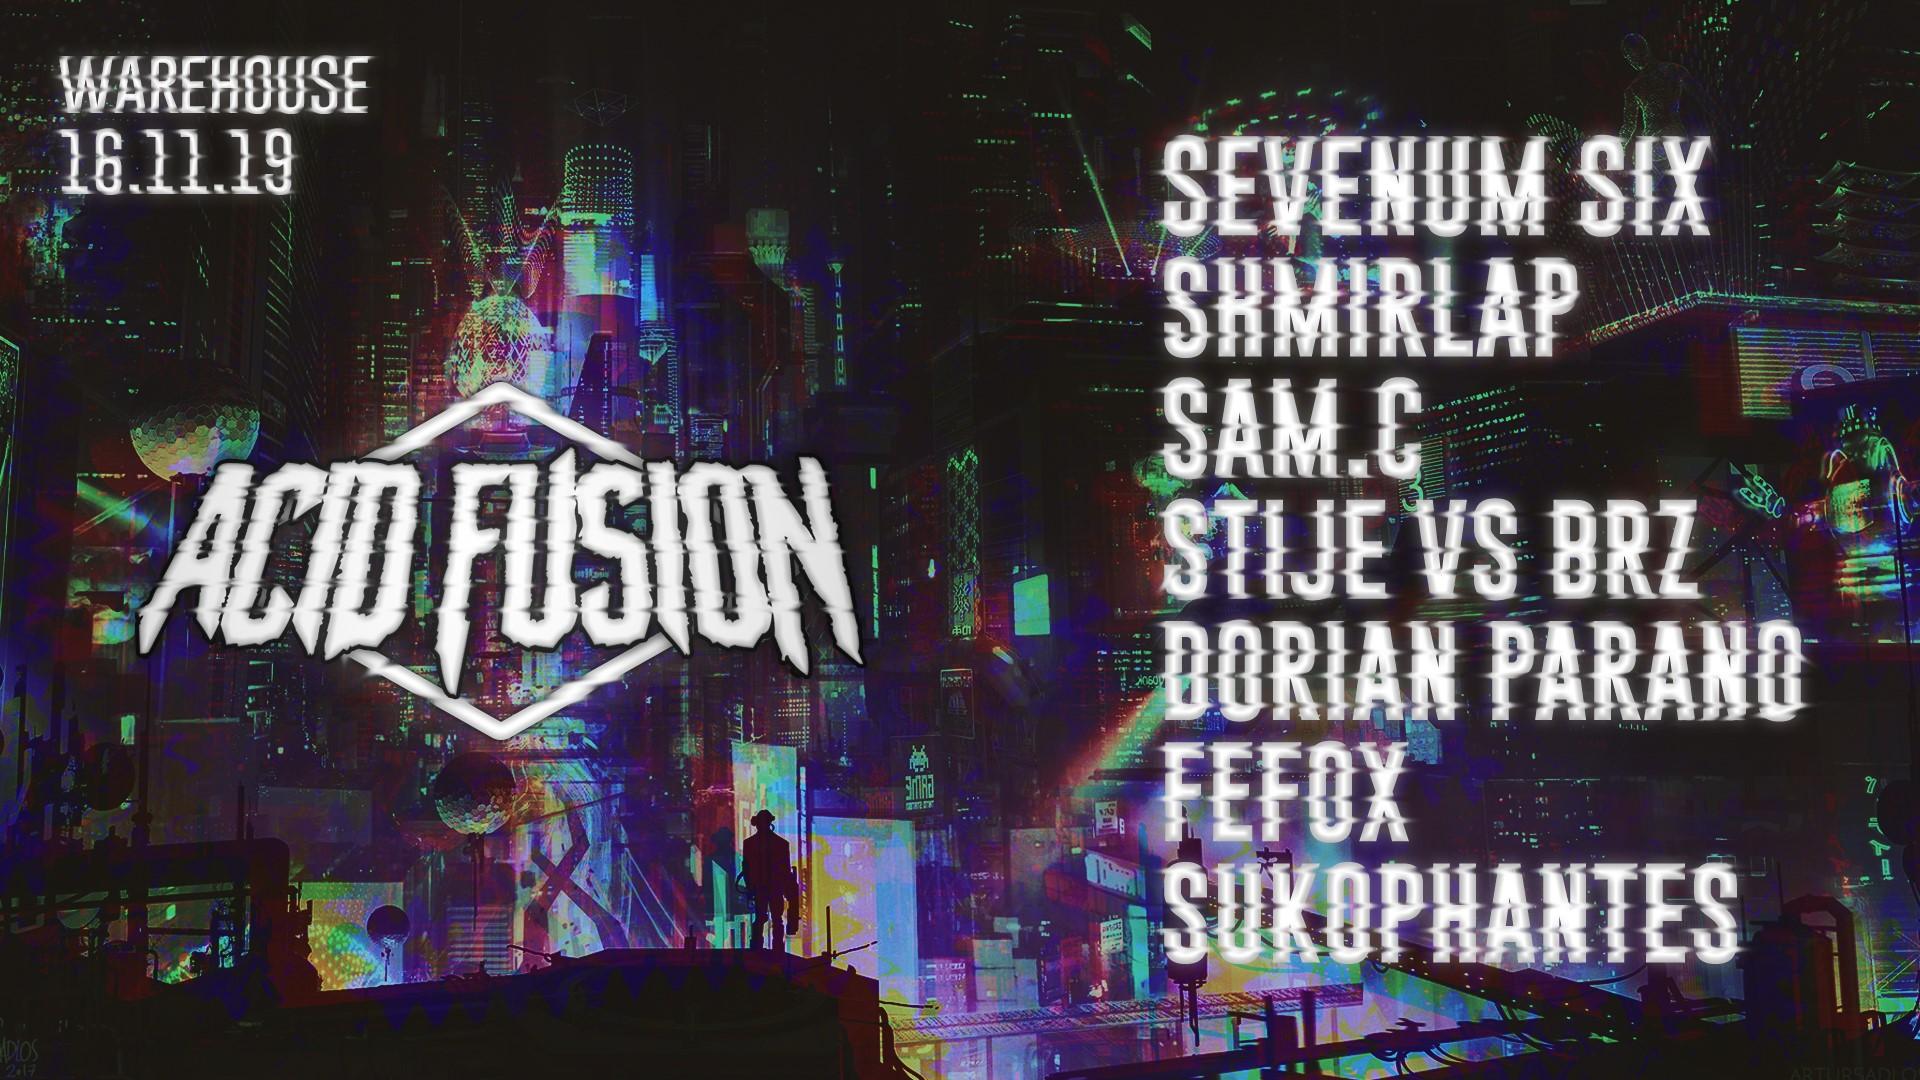 Acid Fusion #2 - Sevenum Six, Shmirlap, Sam C, Stije & More